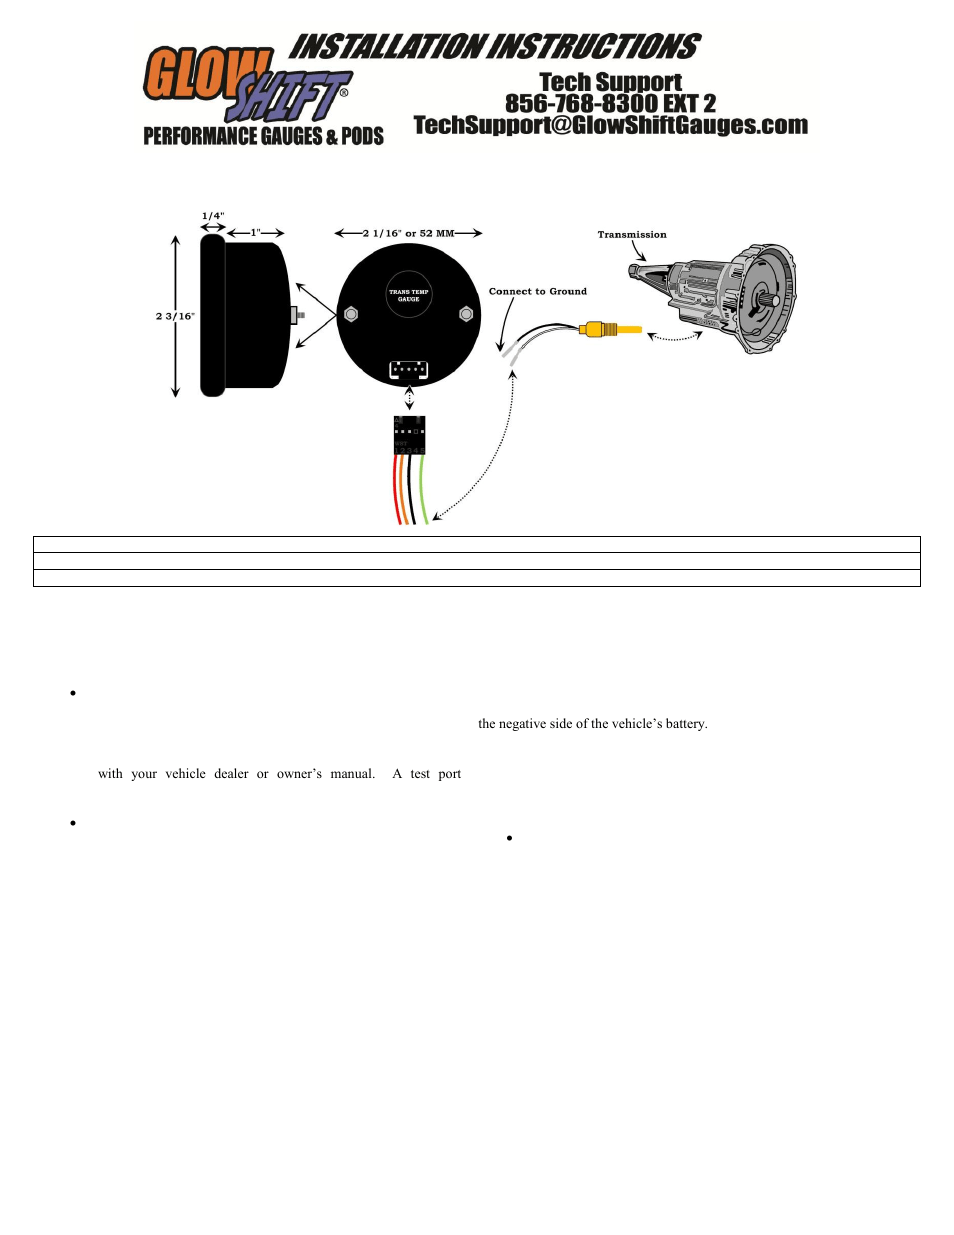 hight resolution of glowshift wire diagram blog wiring diagram glowshift oil pressure gauge wire diagram glowshift wire diagram